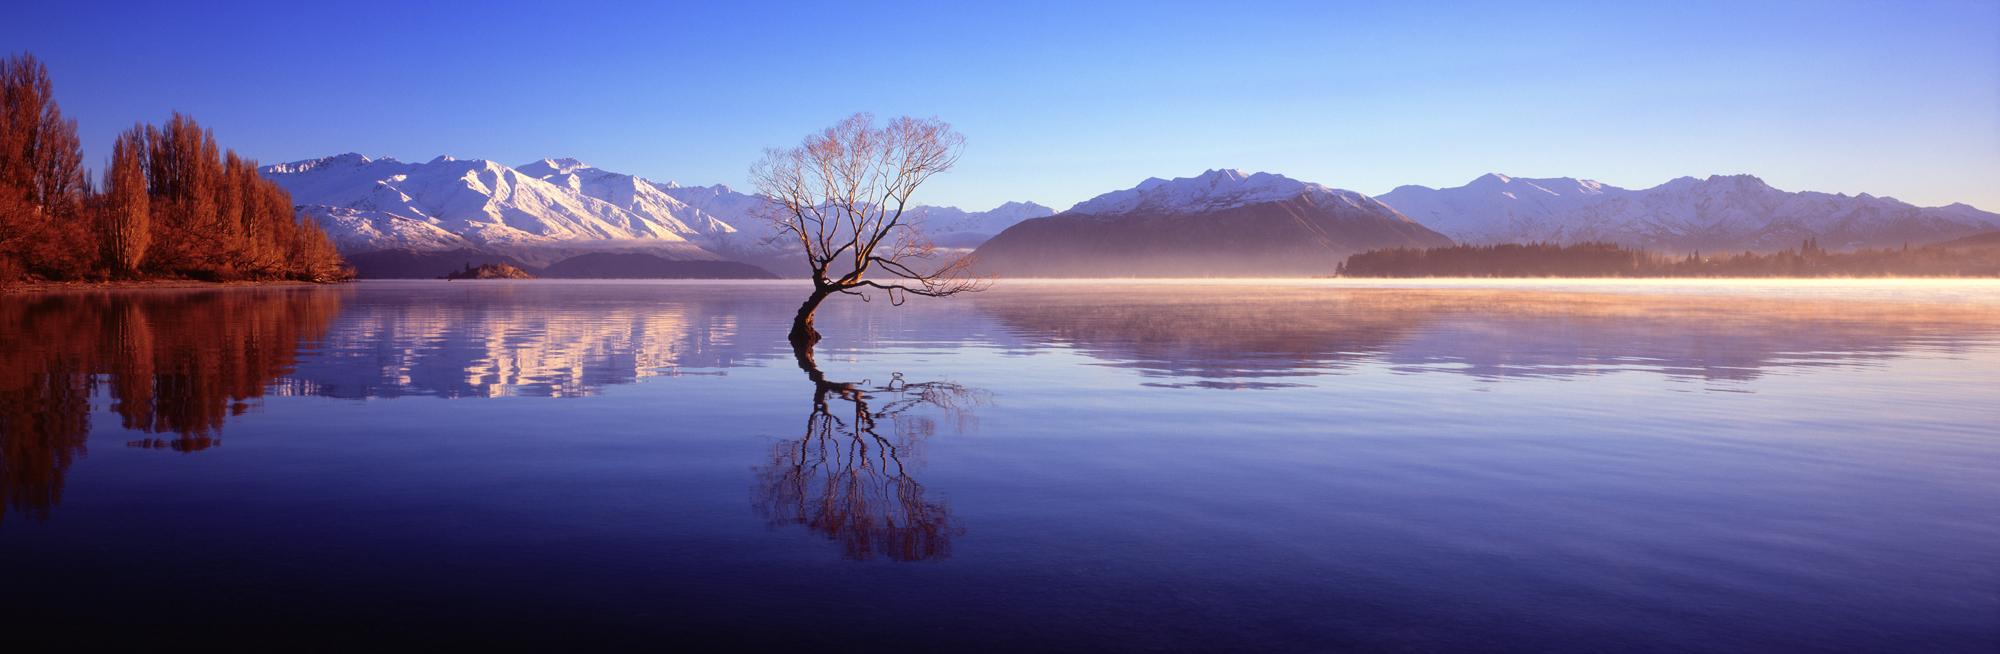 Wanaka New Zealand  city photos gallery : 3000 km à pied à la rencontre de la culture Maori